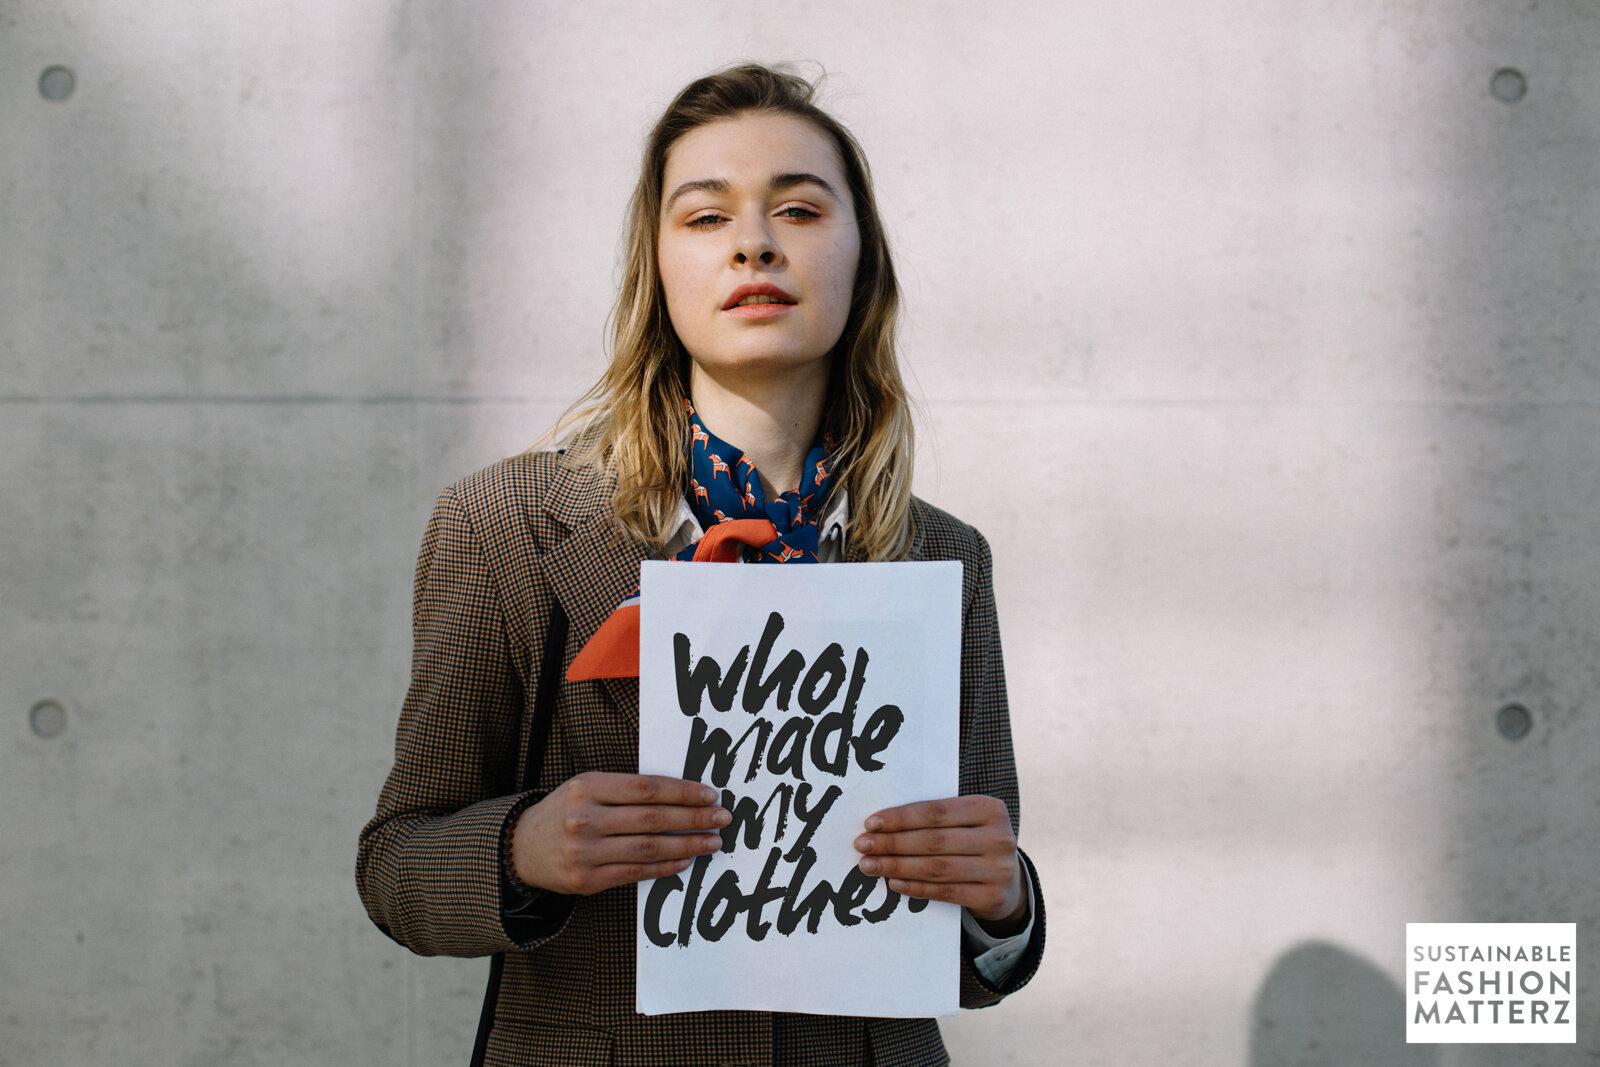 fashion-revolution-by-sustainable-fashion-matterz-208.jpg